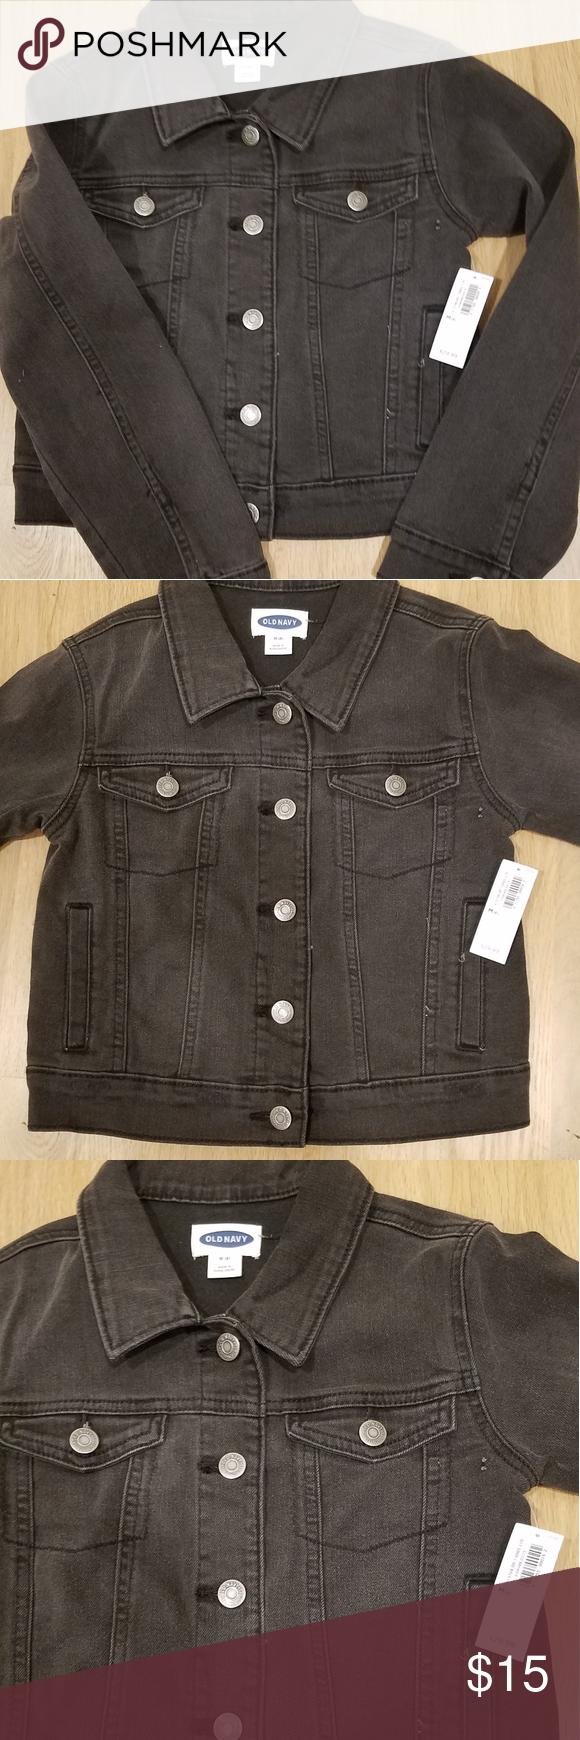 Old Navy Girls Black Jean Jacket Girls Black Jeans Black Jean Jacket Jean Jacket Outfits [ 1740 x 580 Pixel ]